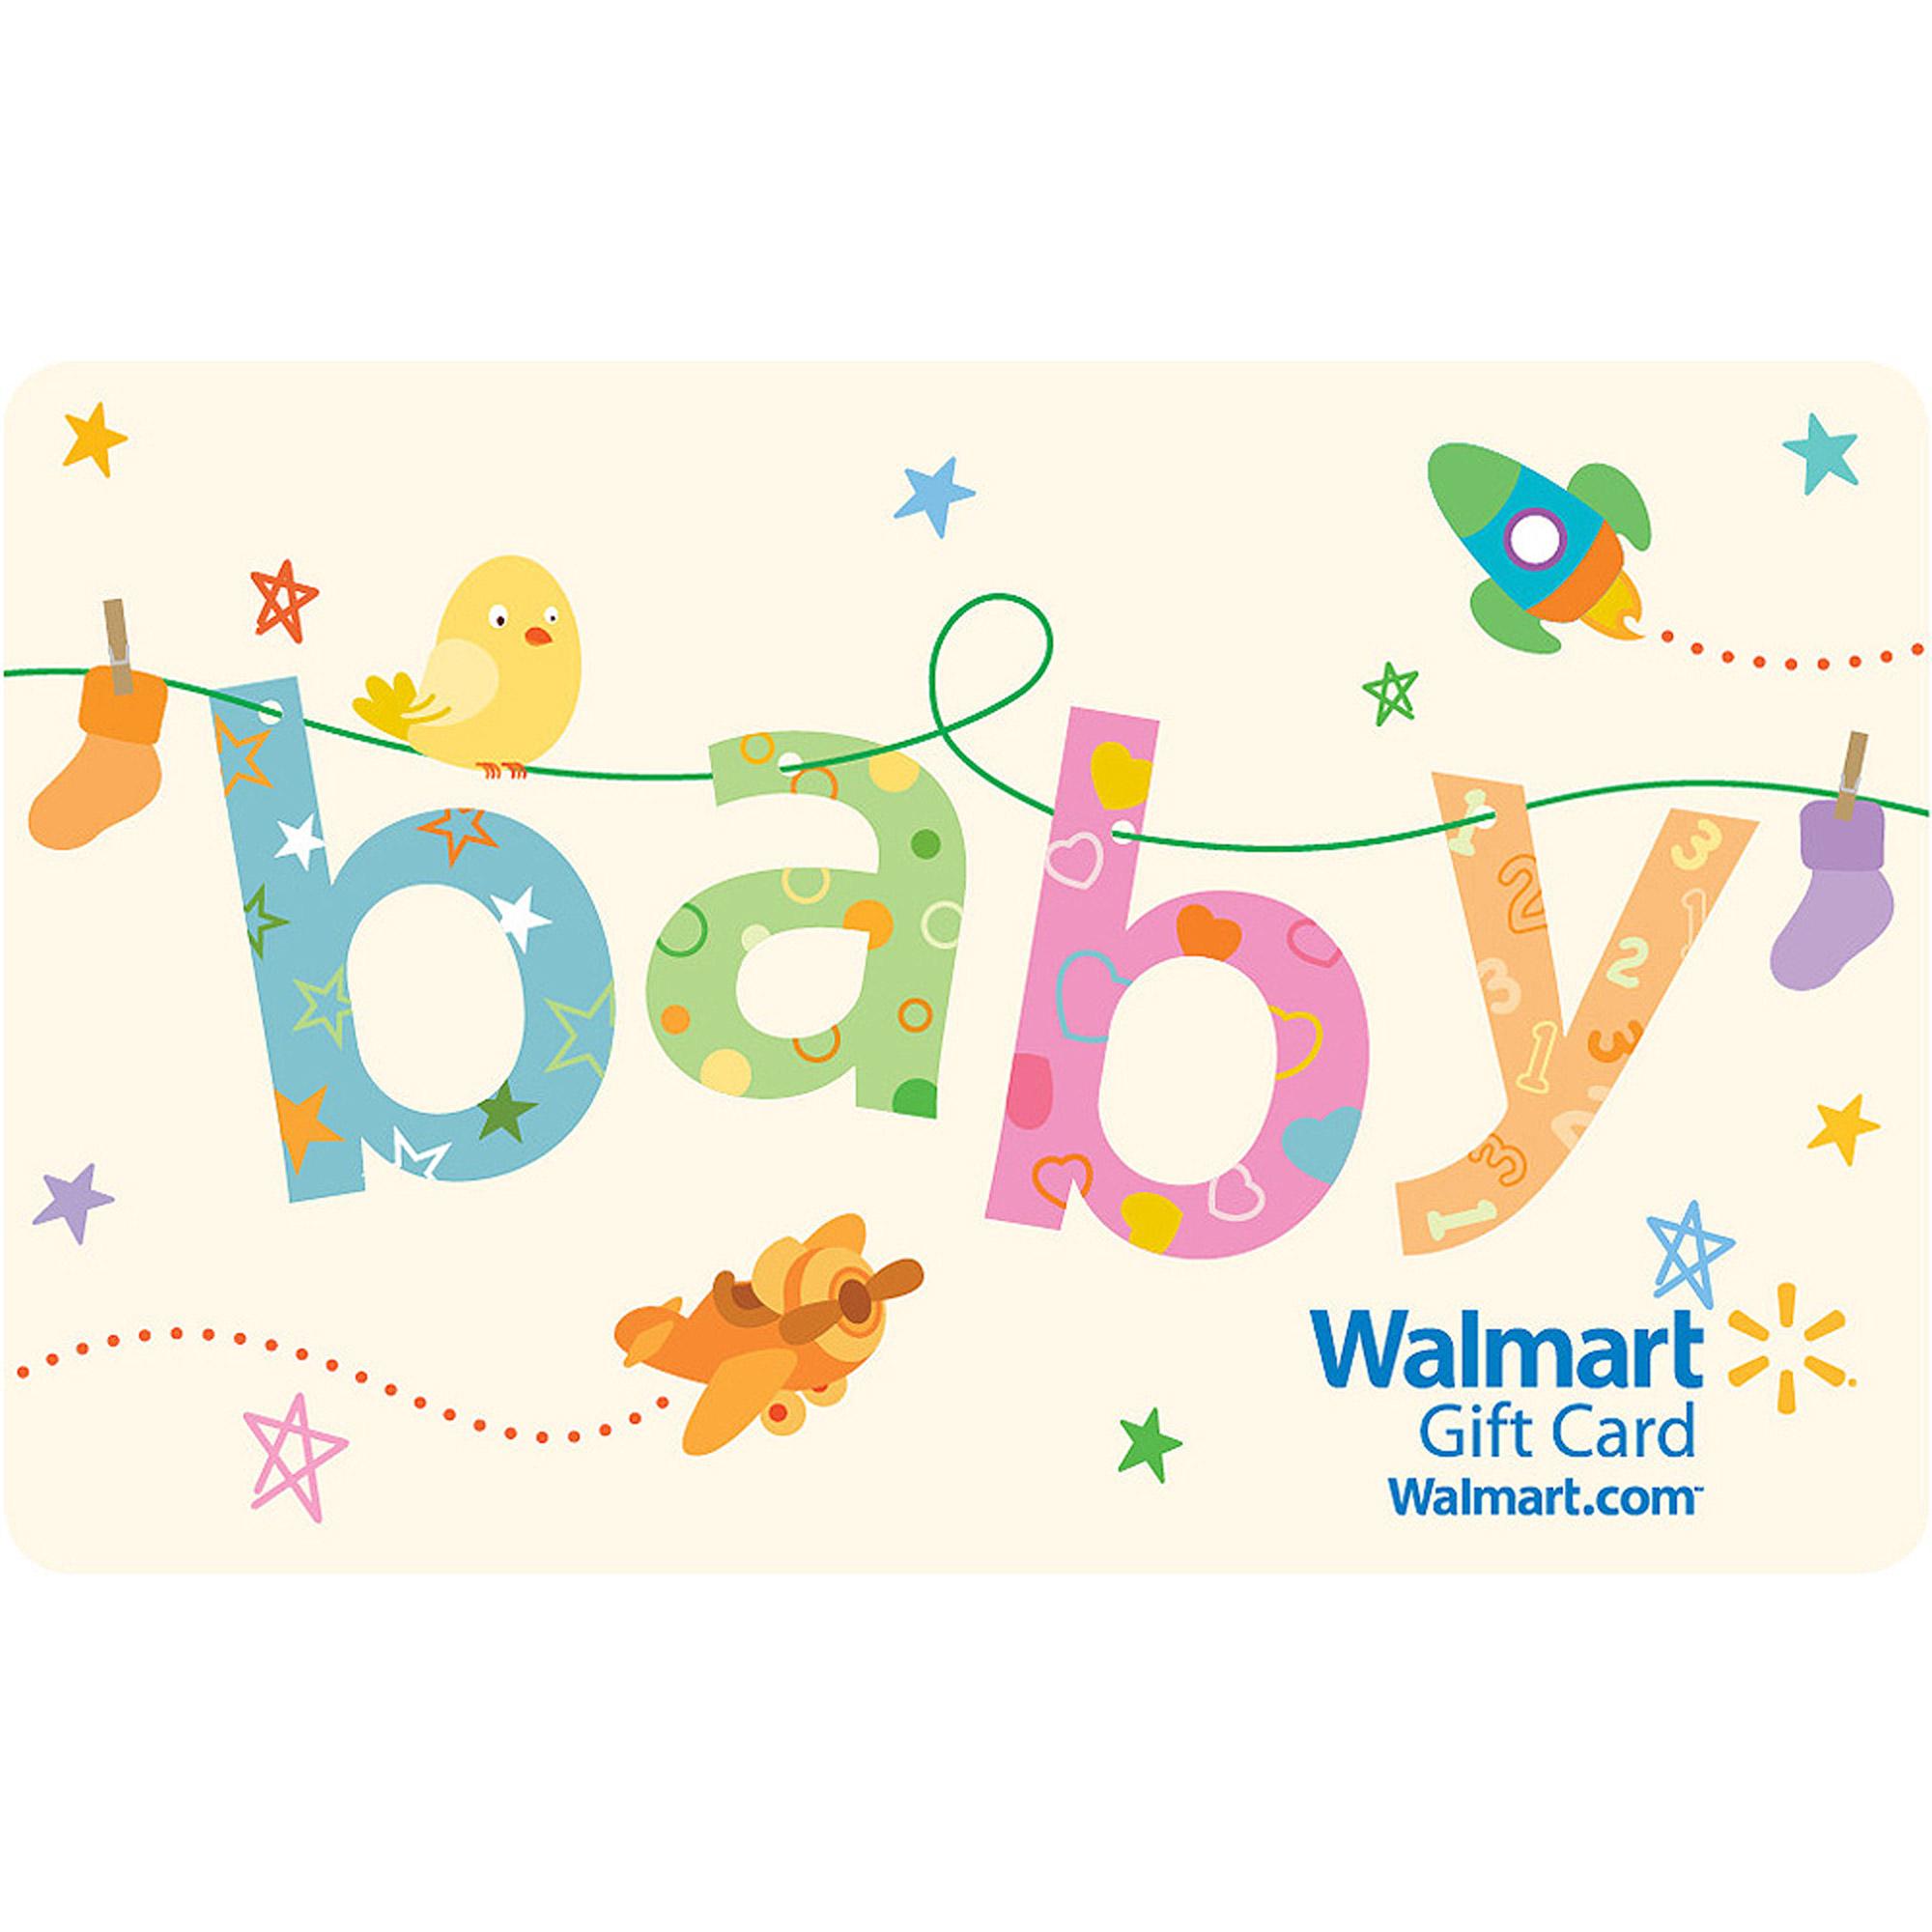 Walmart T Card Clipart 20 Free Cliparts